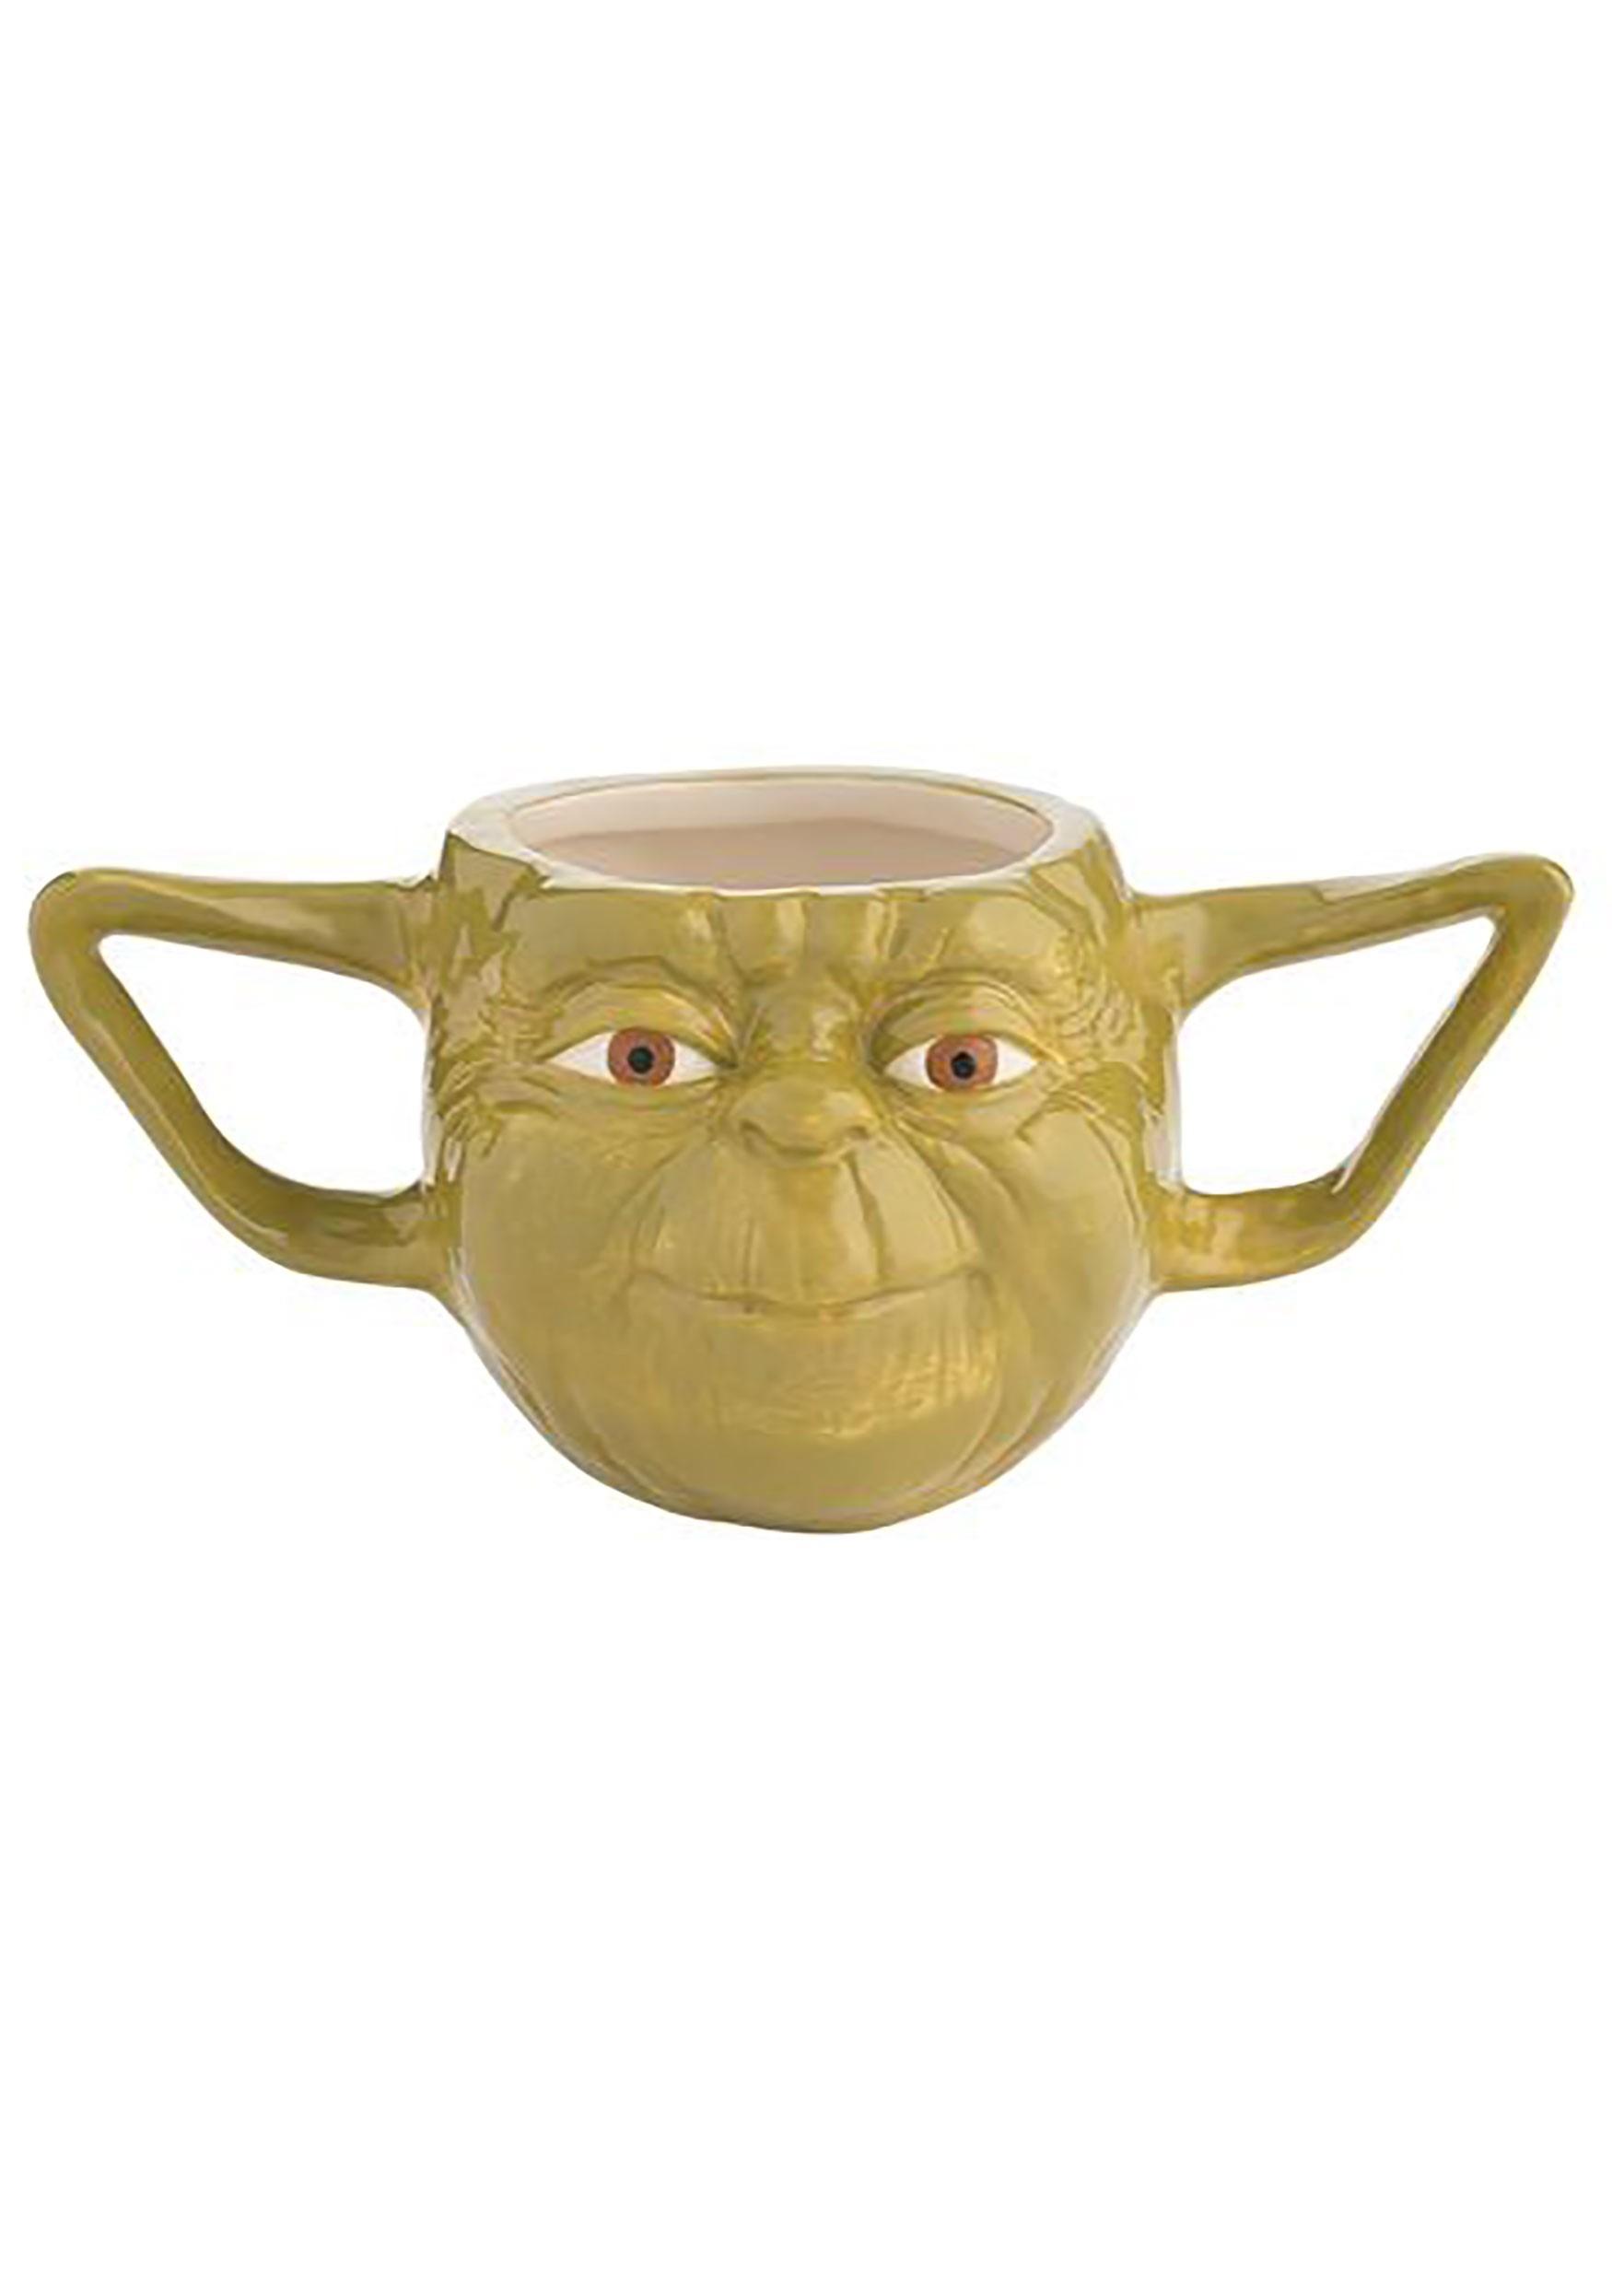 The Yoda Sculpted Mug